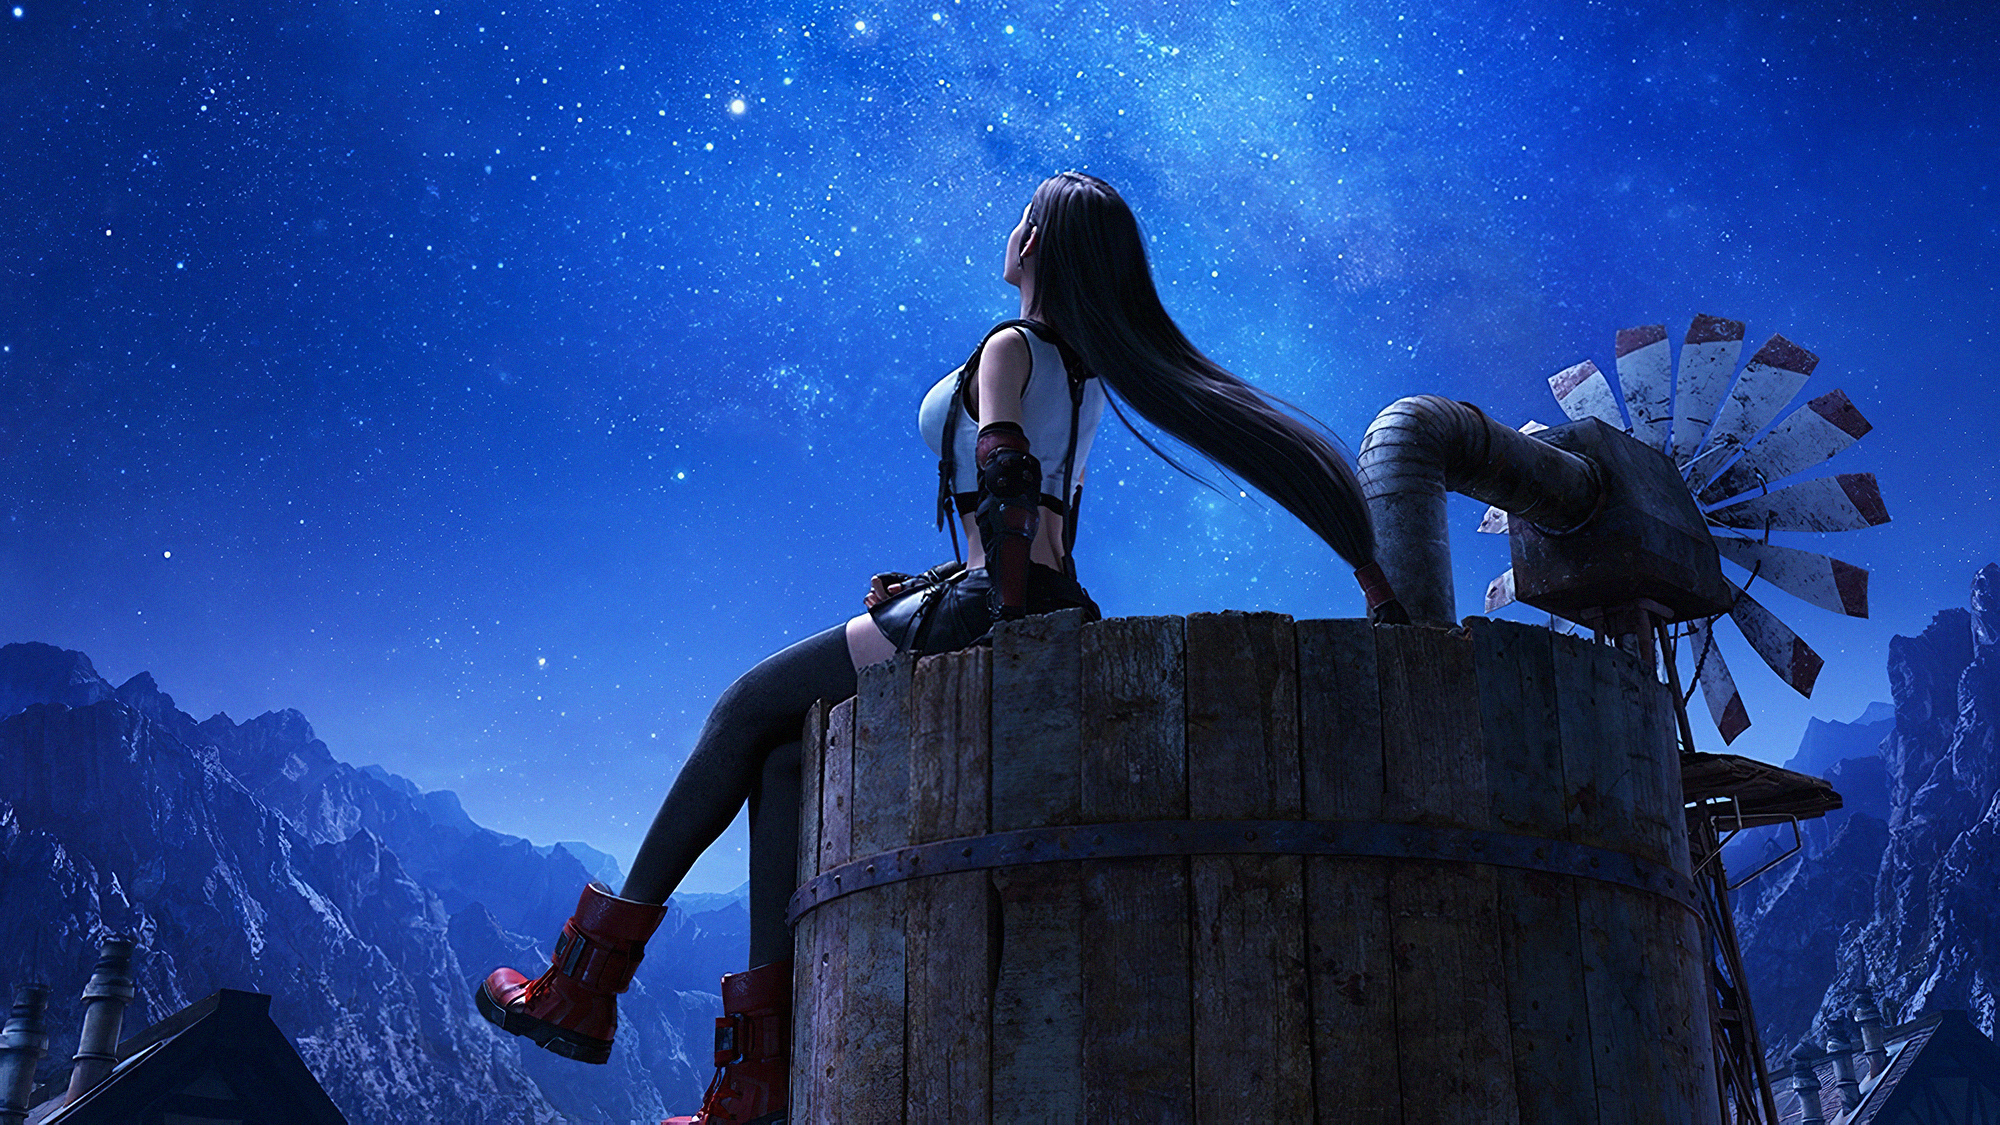 Tifa Lockhart Final Fantasy 7 Remake Wallpaper Hd Games 4k